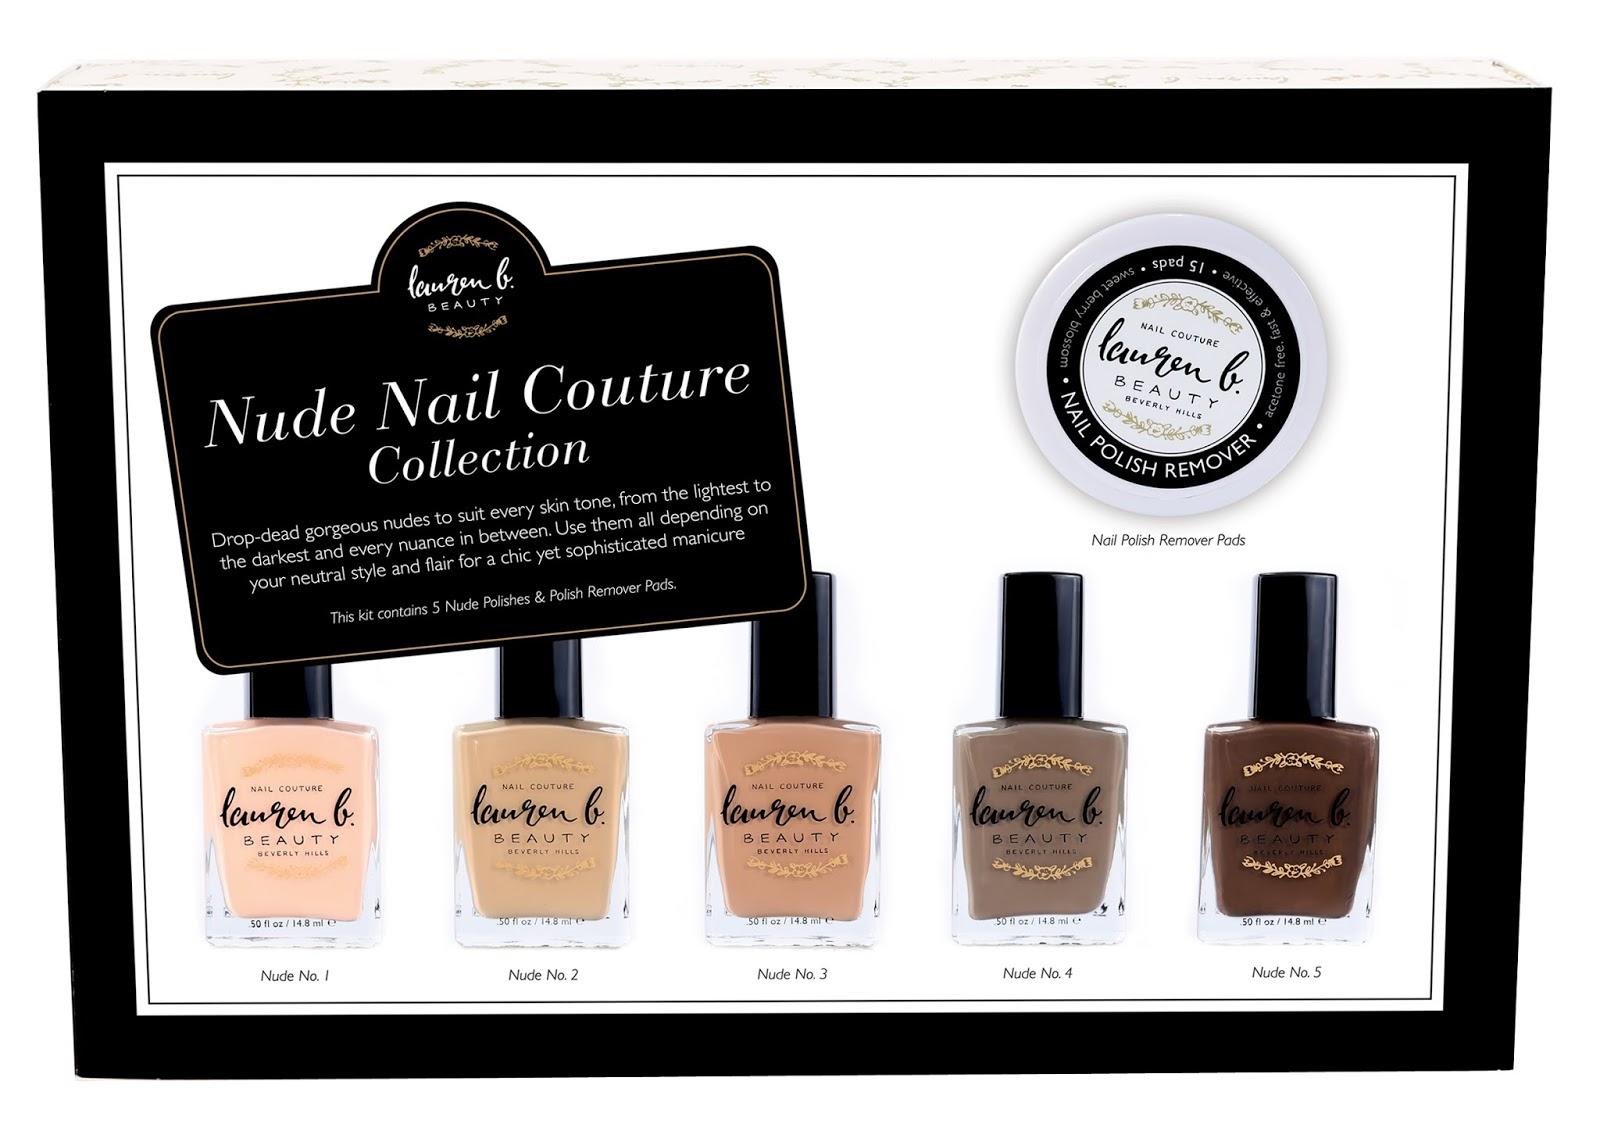 Holiday Gifts for Nail Polish Lovers | The Nail Polish Exchange